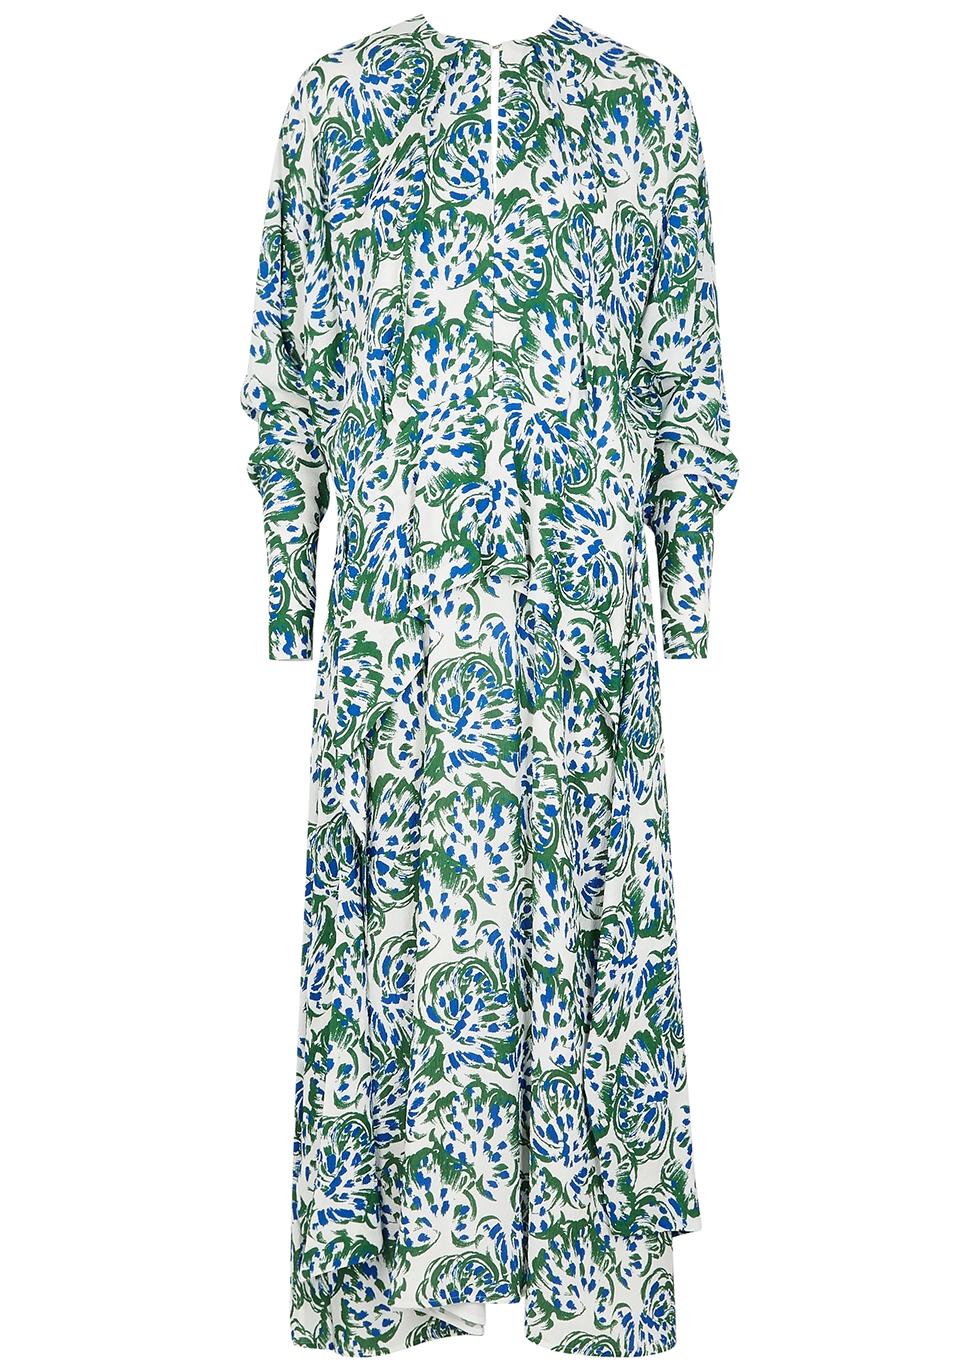 bb02844cbc4b Designer Dresses & Designer Gowns - Harvey Nichols